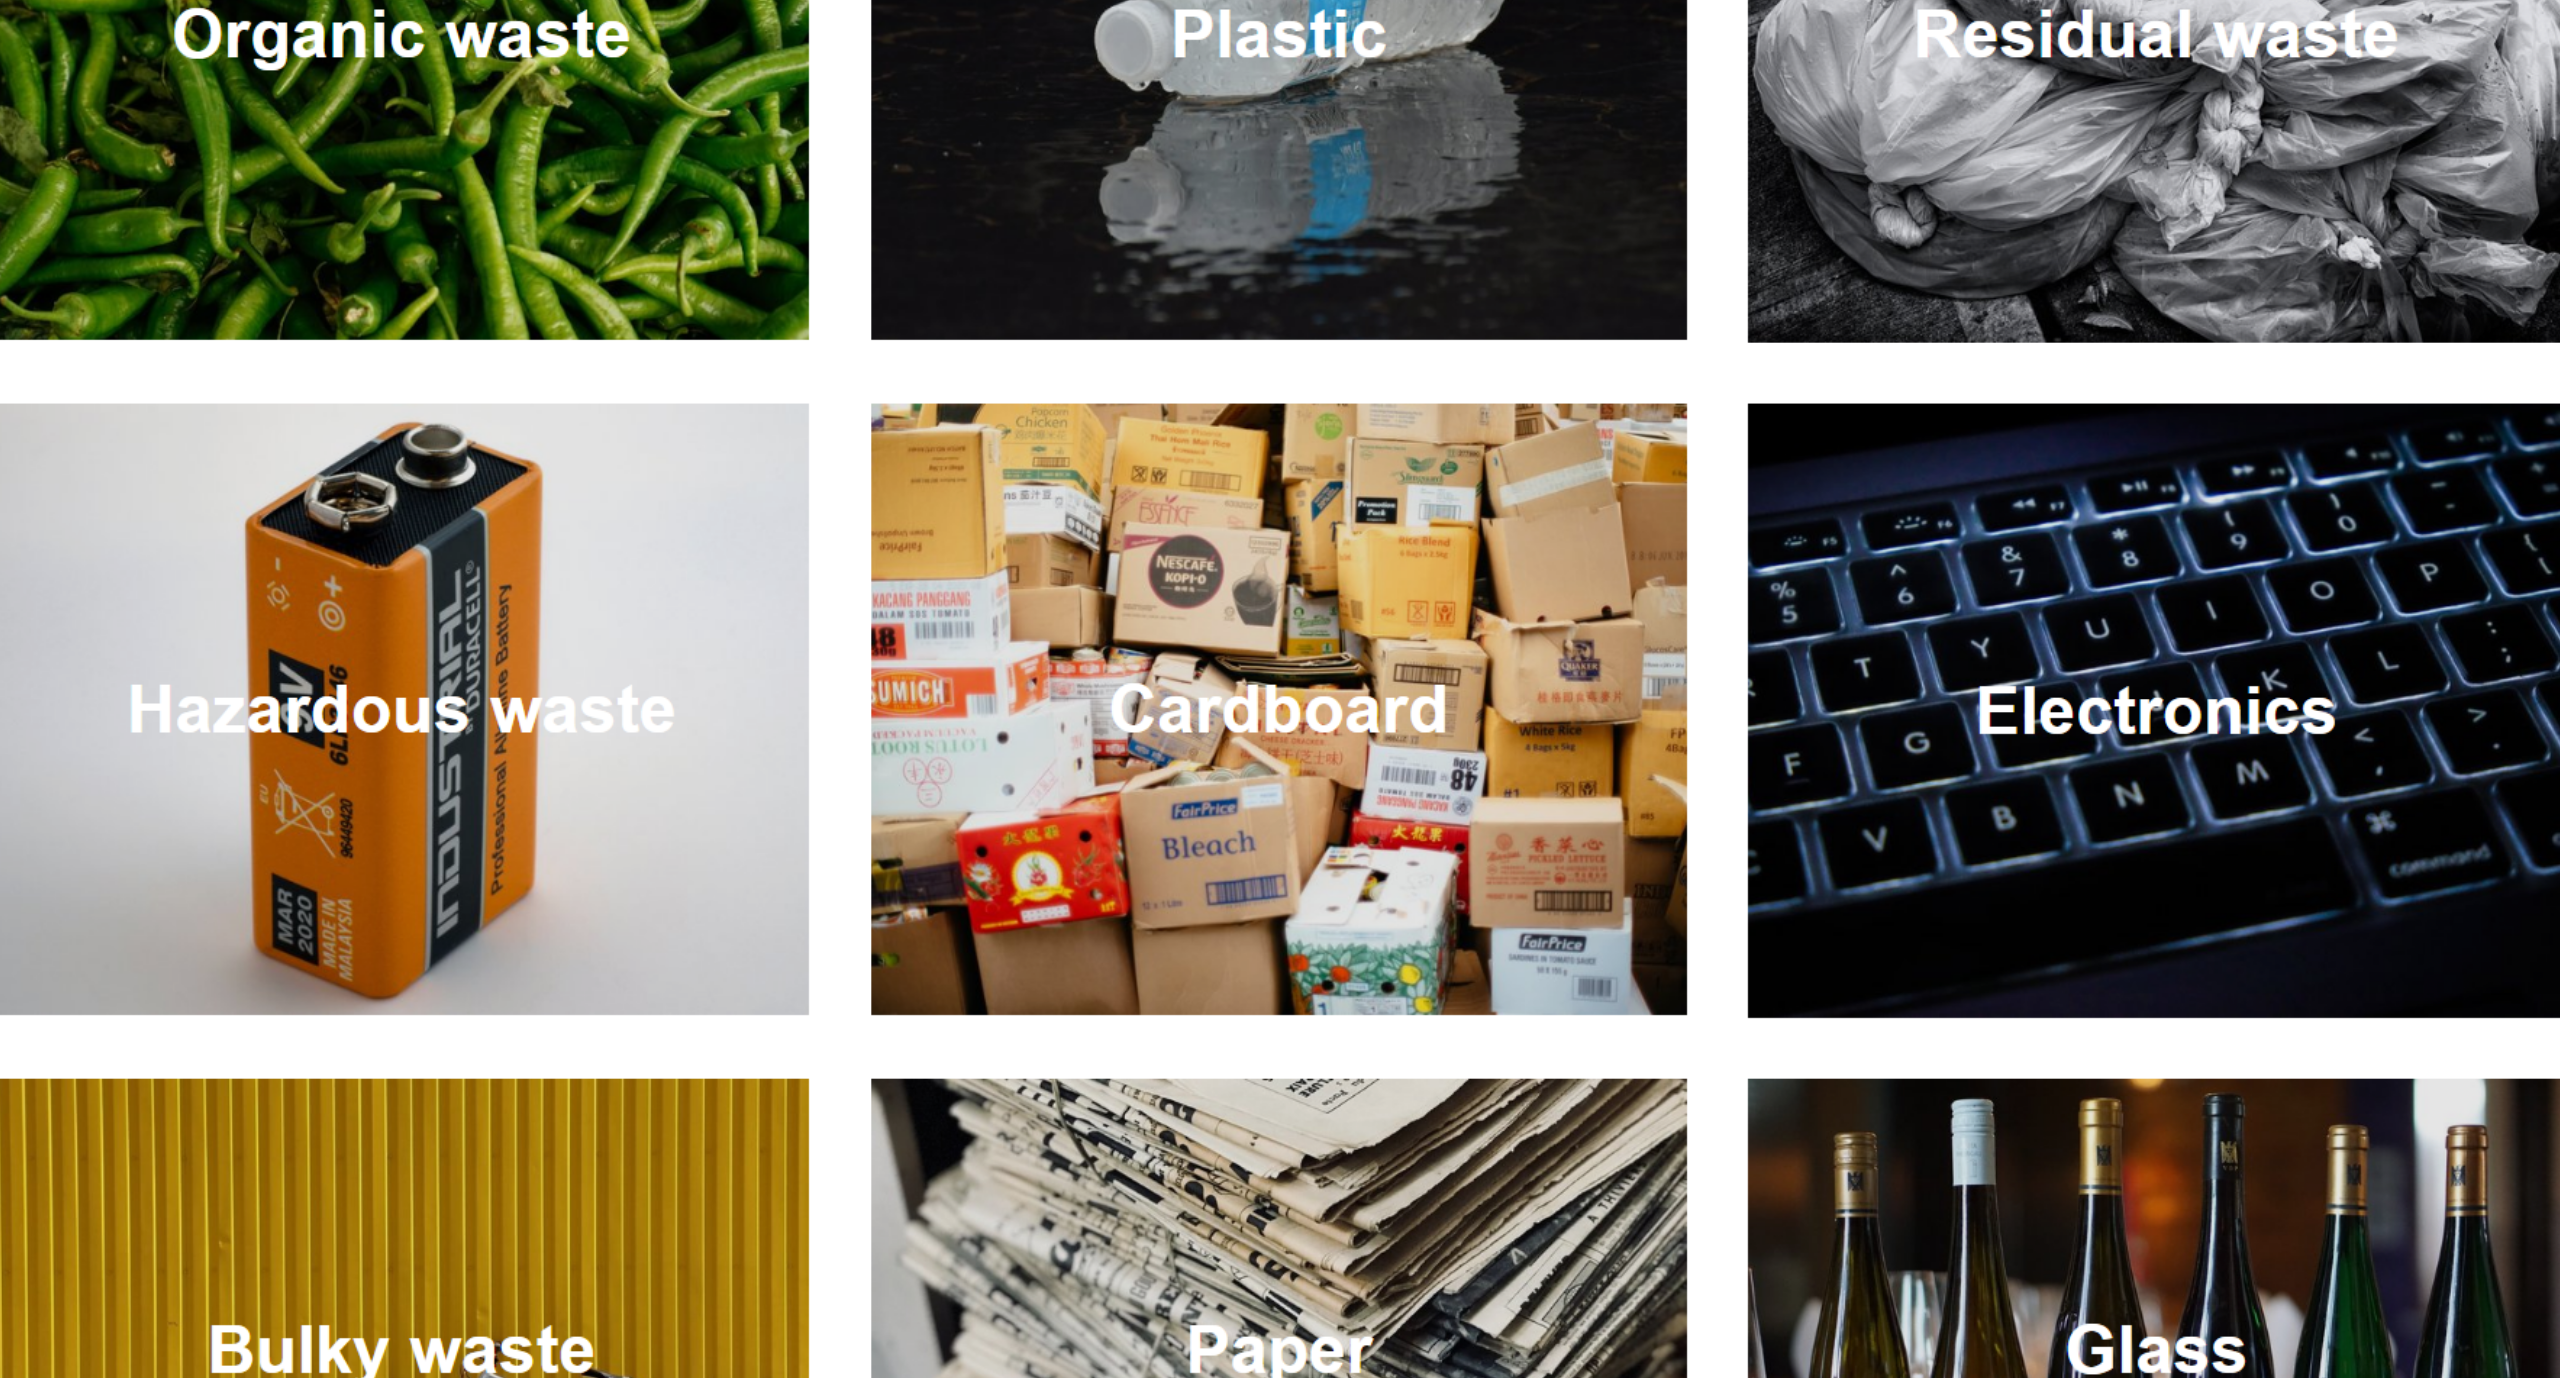 Recycle in Denmark affaldssortering